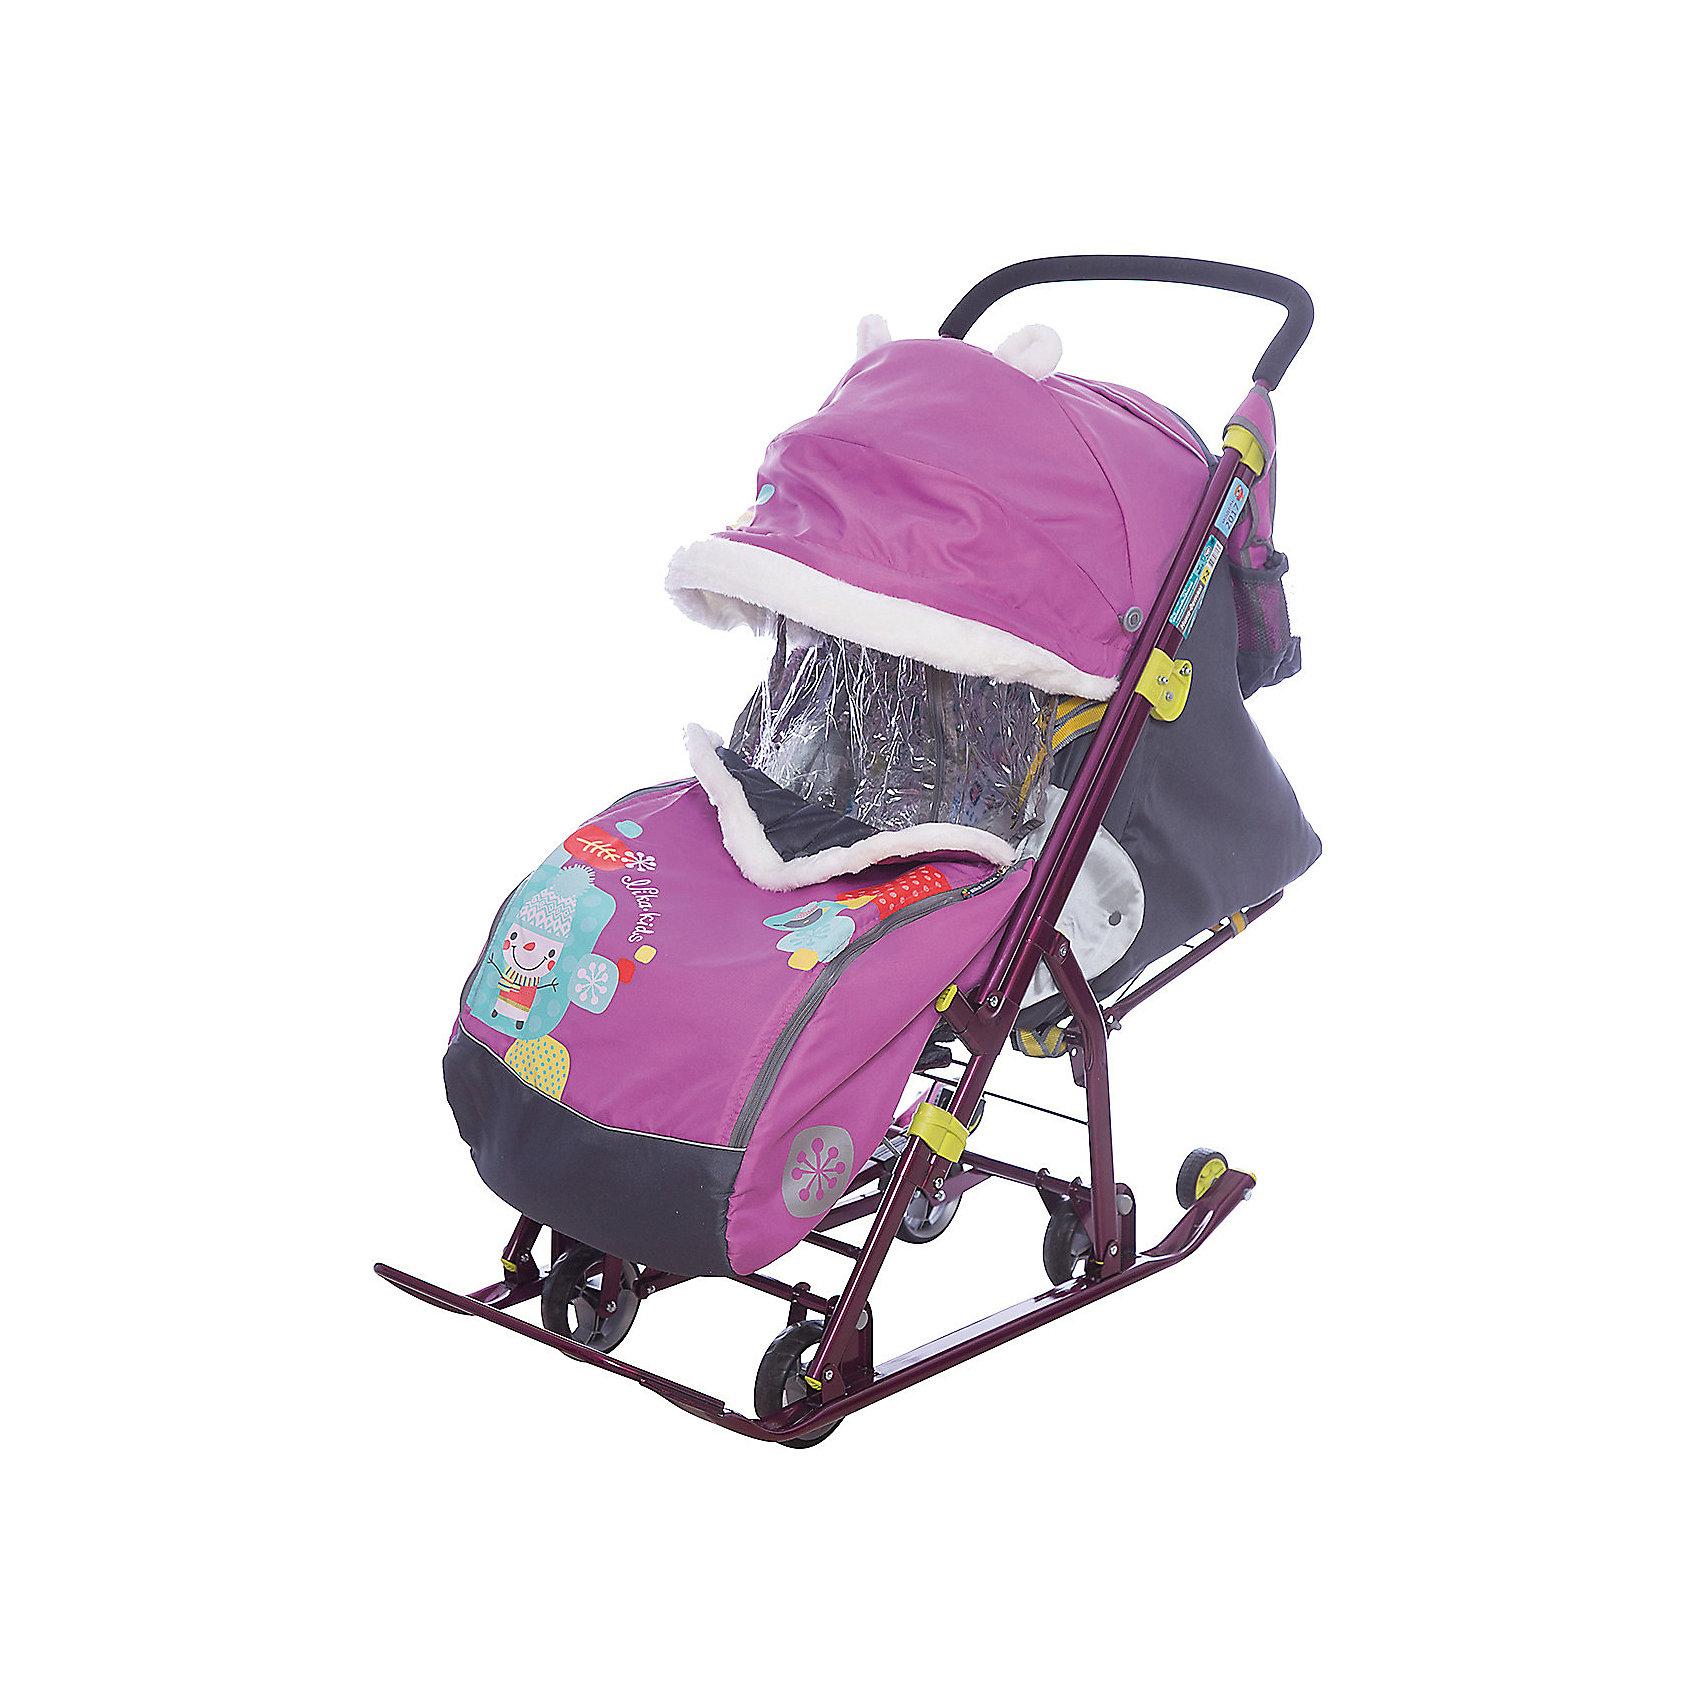 Ника Санки-коляска Ника детям 7-2, Коллаж-снеговик, ника санки коляска детские лилия